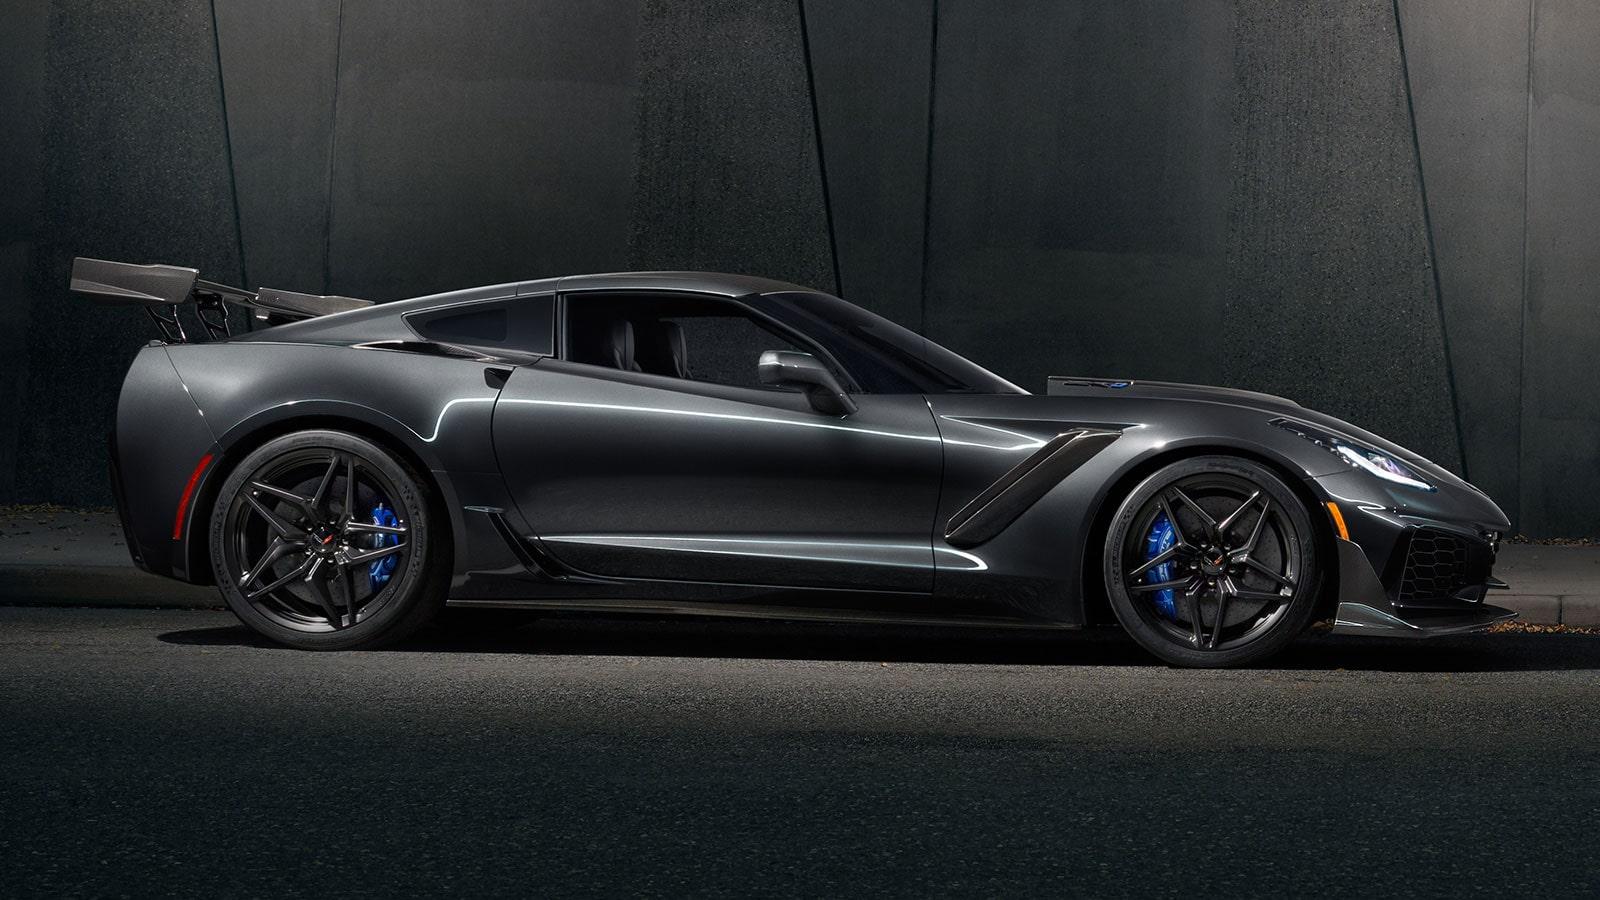 Chevrolet Homepage: 2019 Corvette ZR1 Supercar Reveal